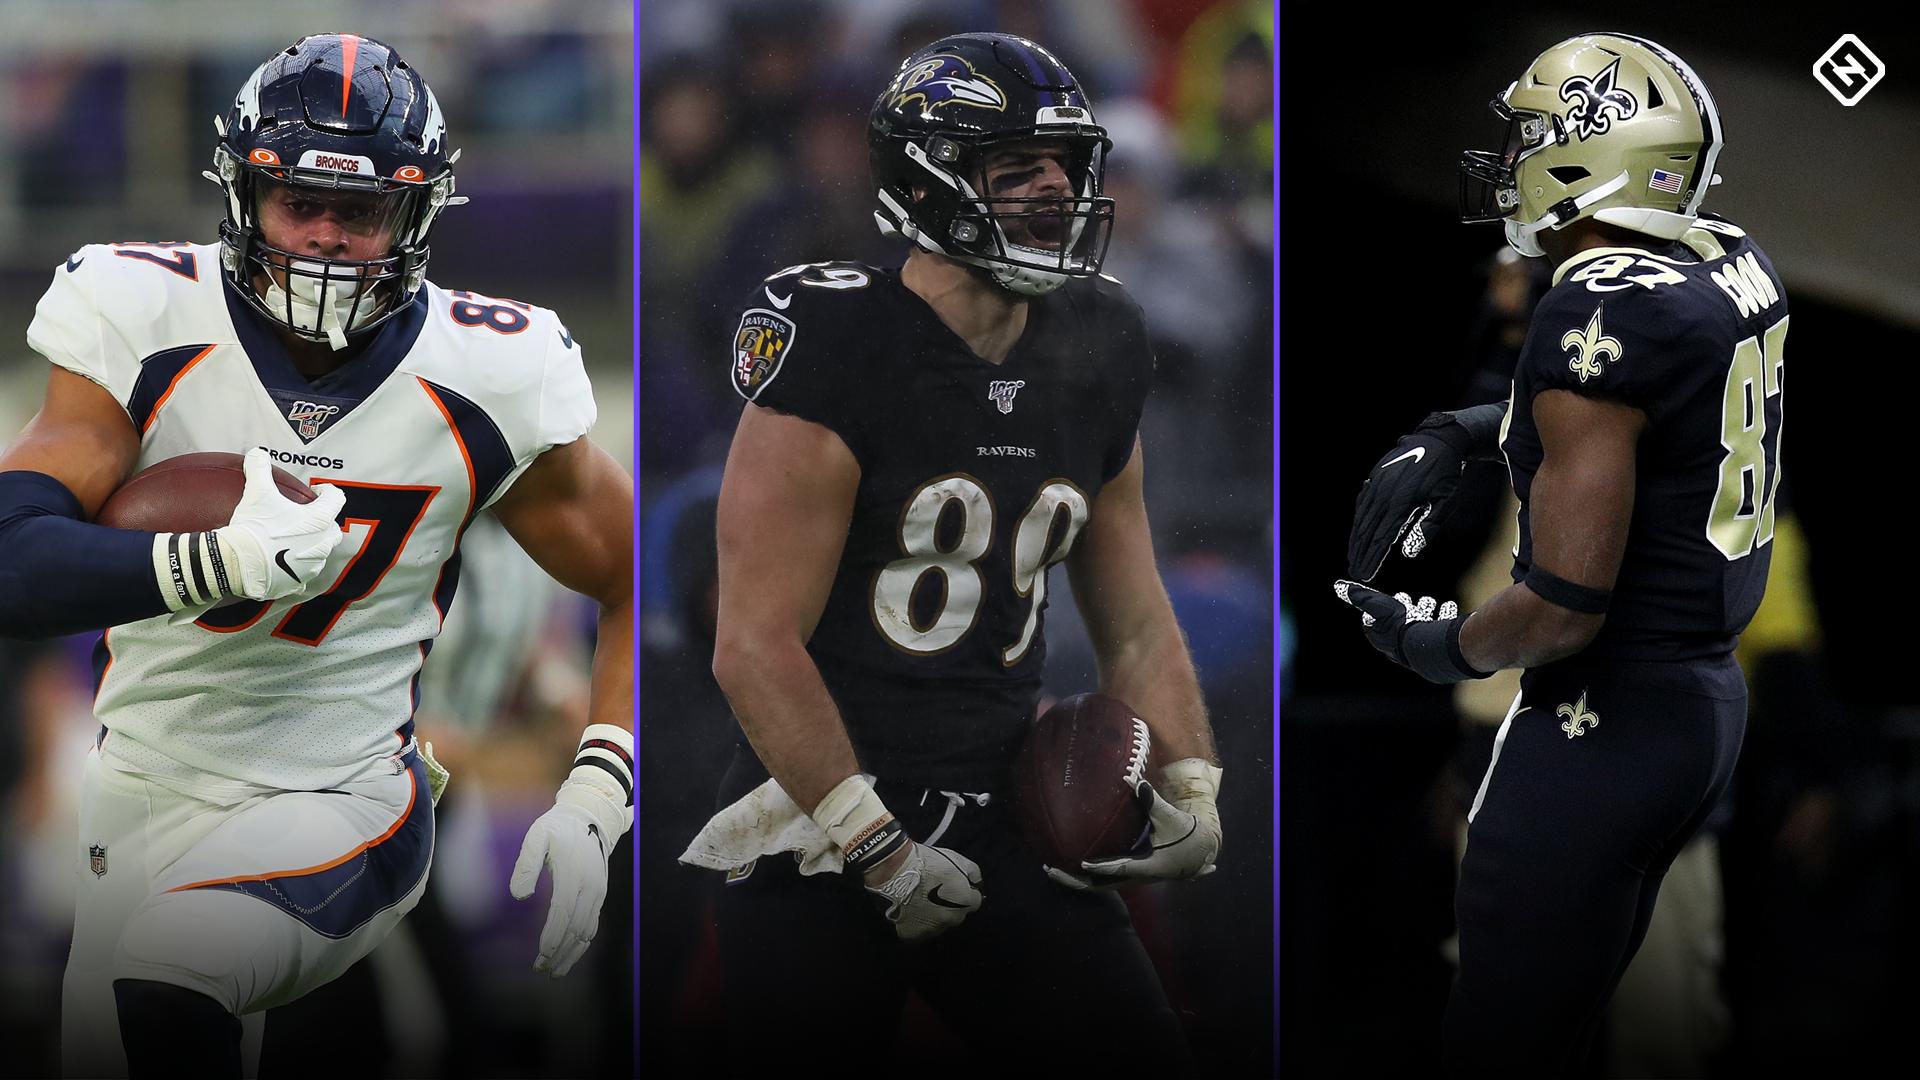 Fantasy Football Injury Updates: Noah Fant, Mark Andrews, Jared Cook affect Week 15 TE rankings